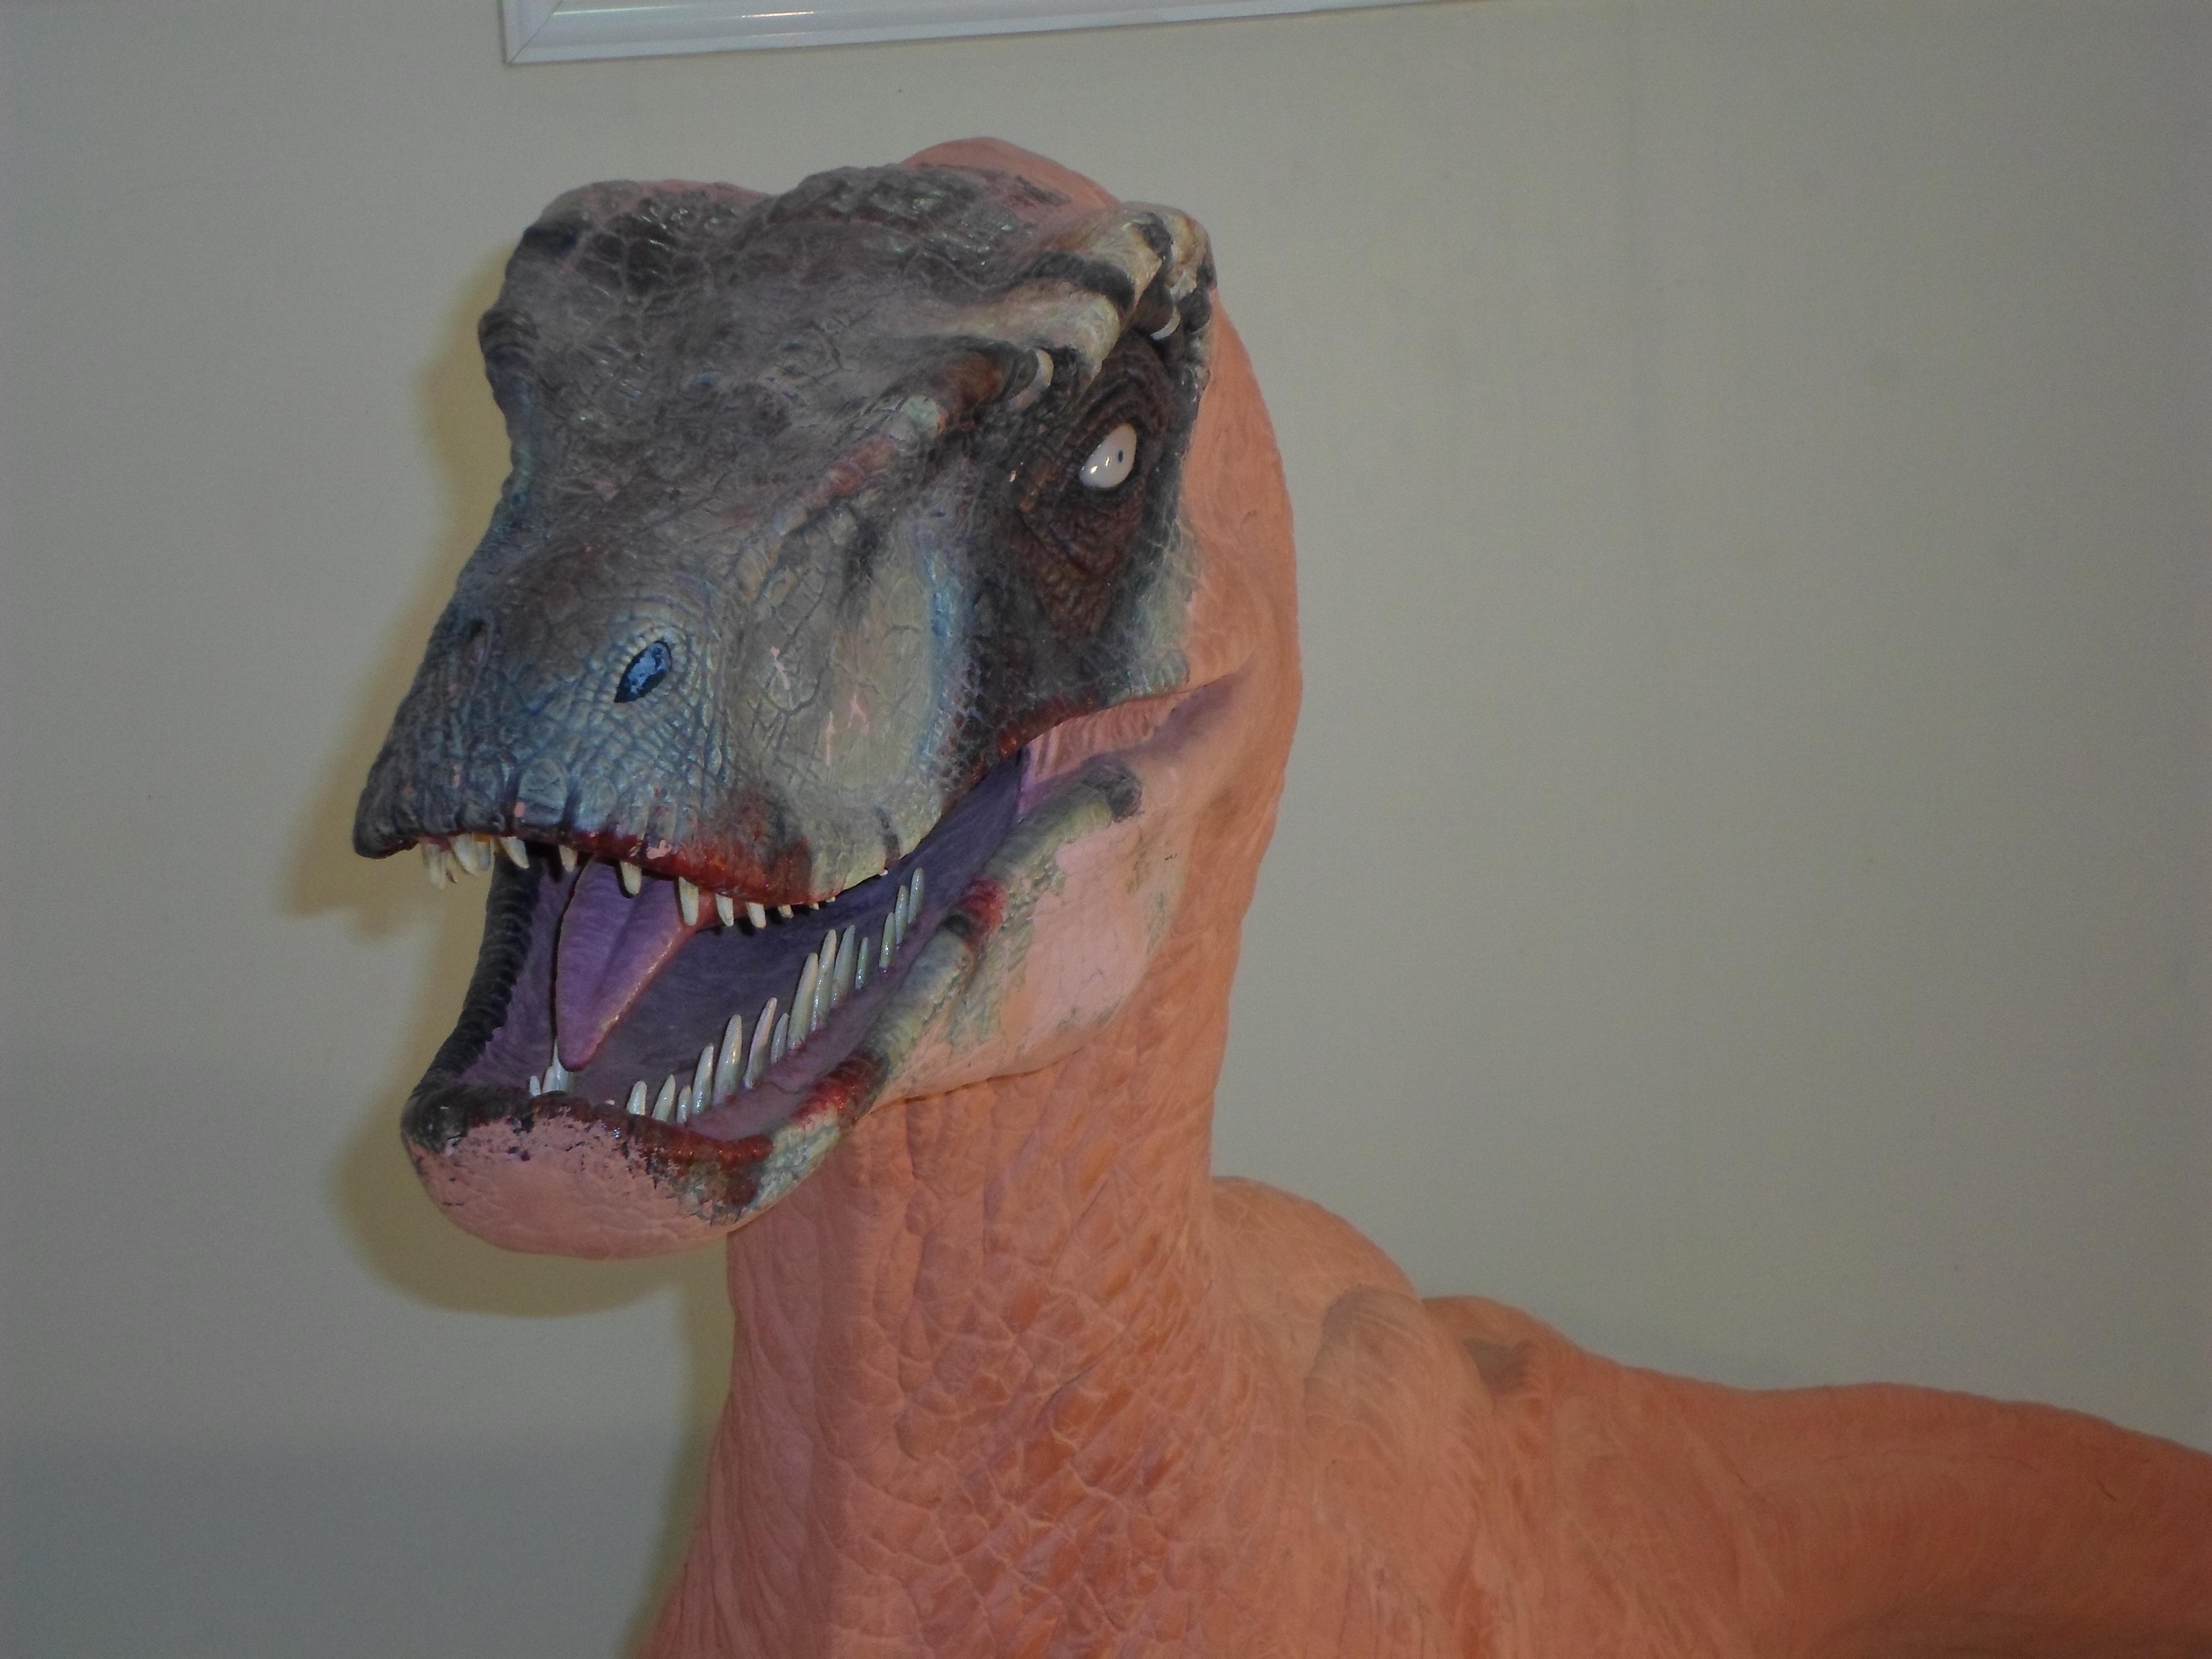 deinonychus sculpture by pheaston - photo #47